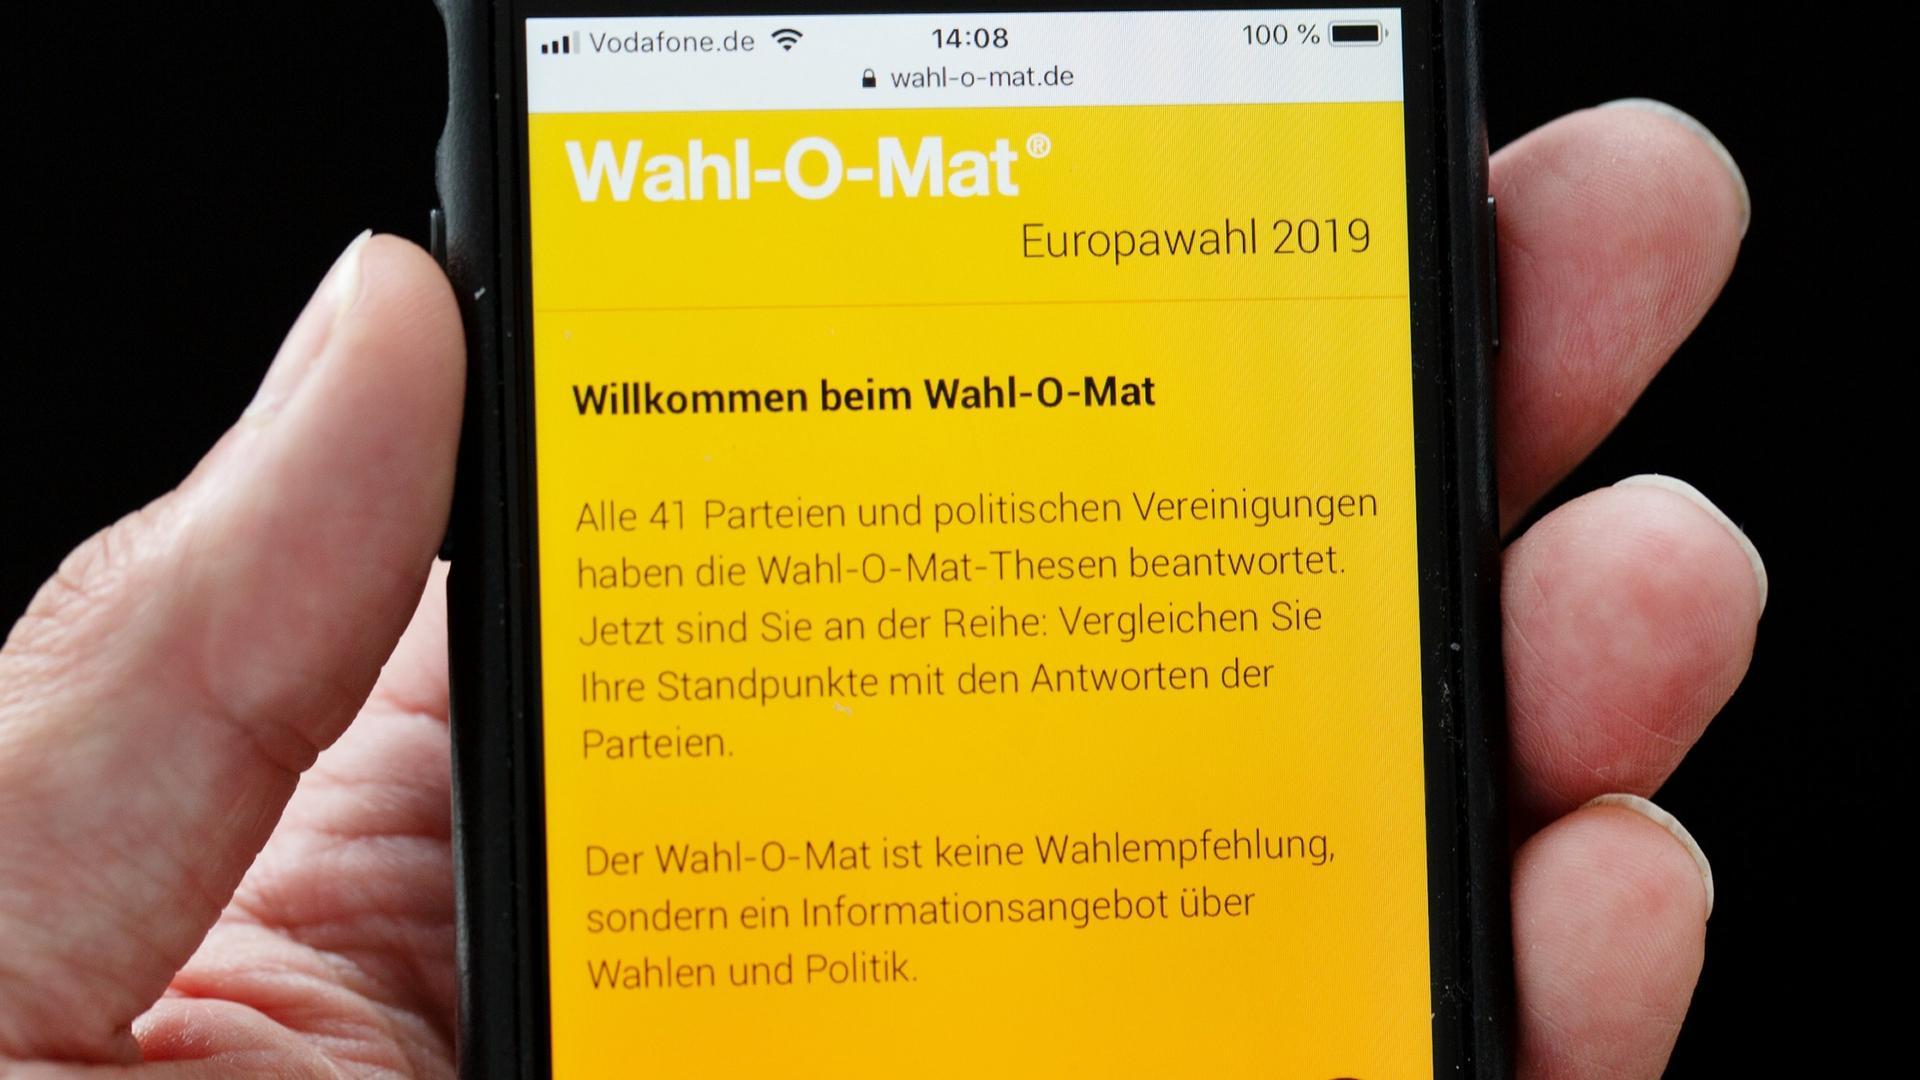 Wahl-O-Mat stellt Abrufrekord auf